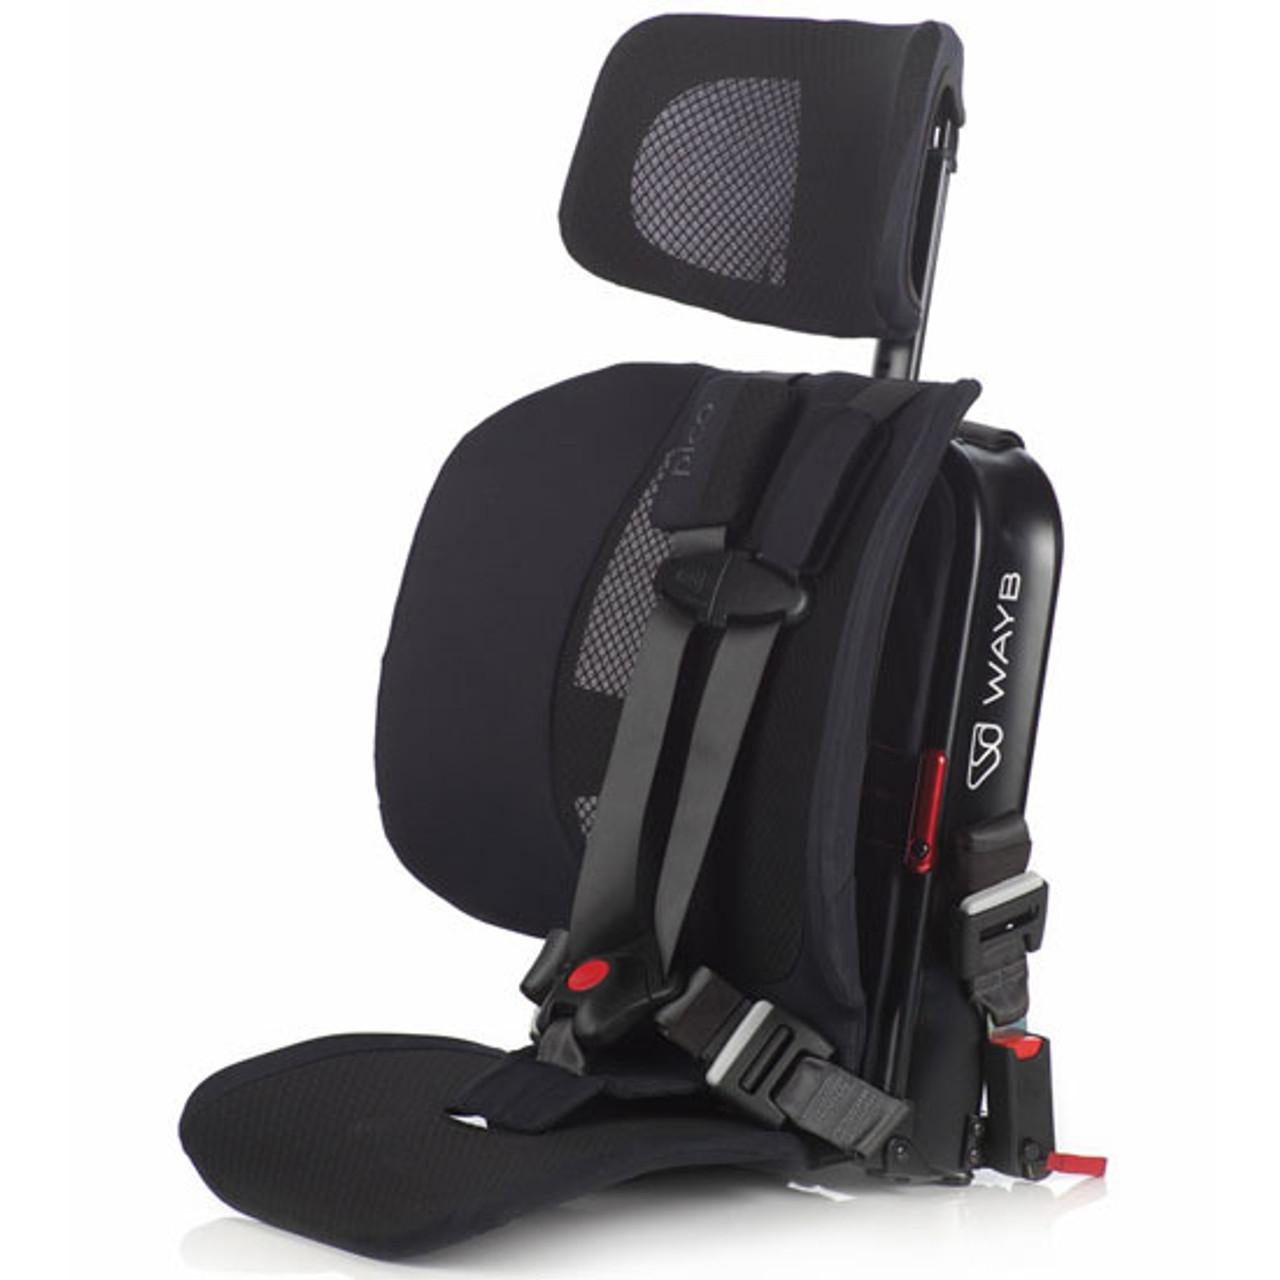 WAYB Pico Travel Booster Car Seat